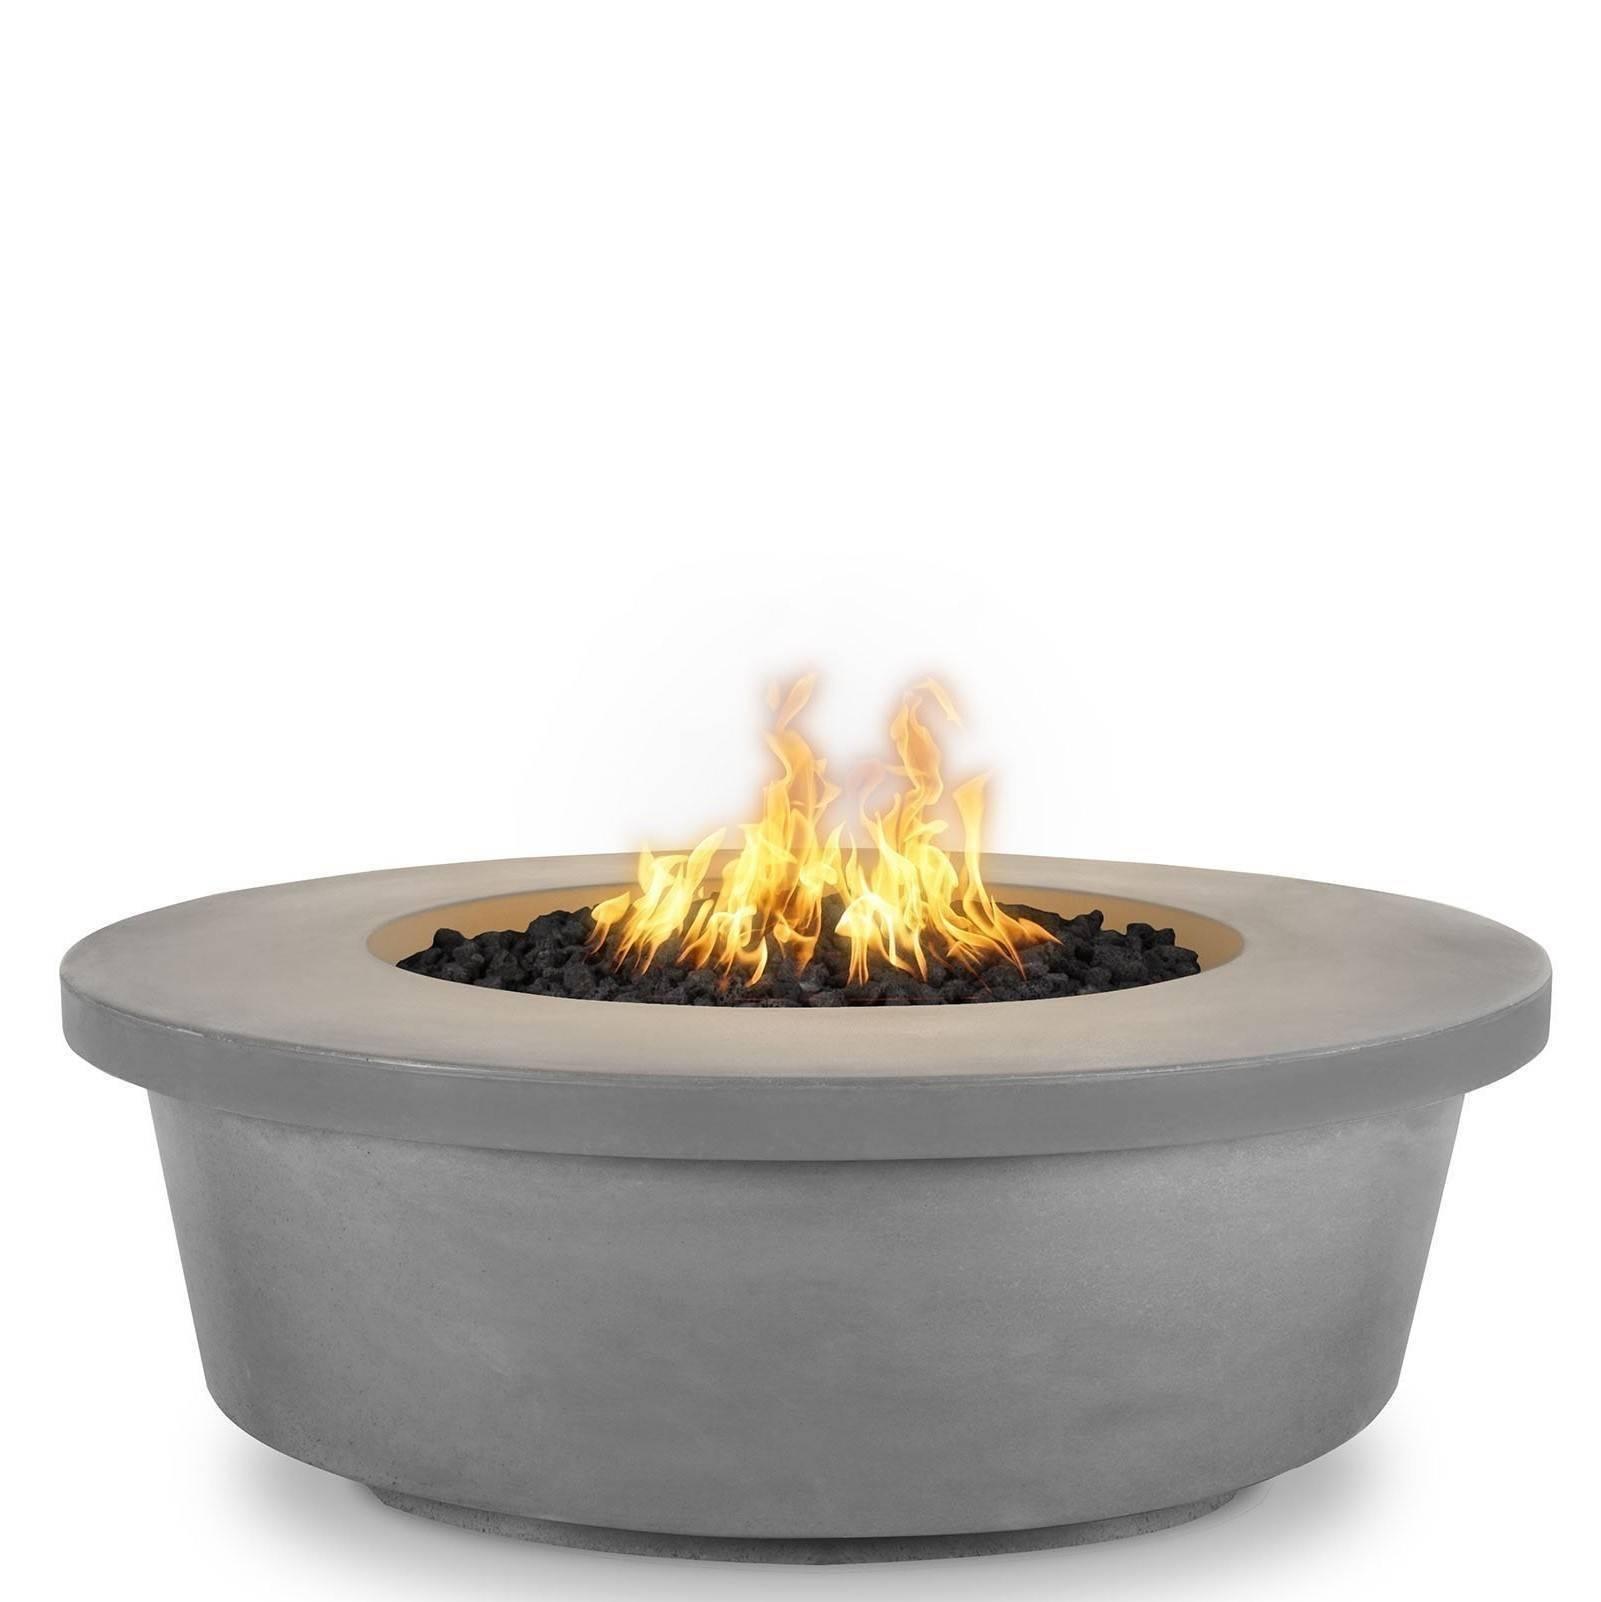 "48"" Tempe Concrete Fire Pit Table - Natural Grey"